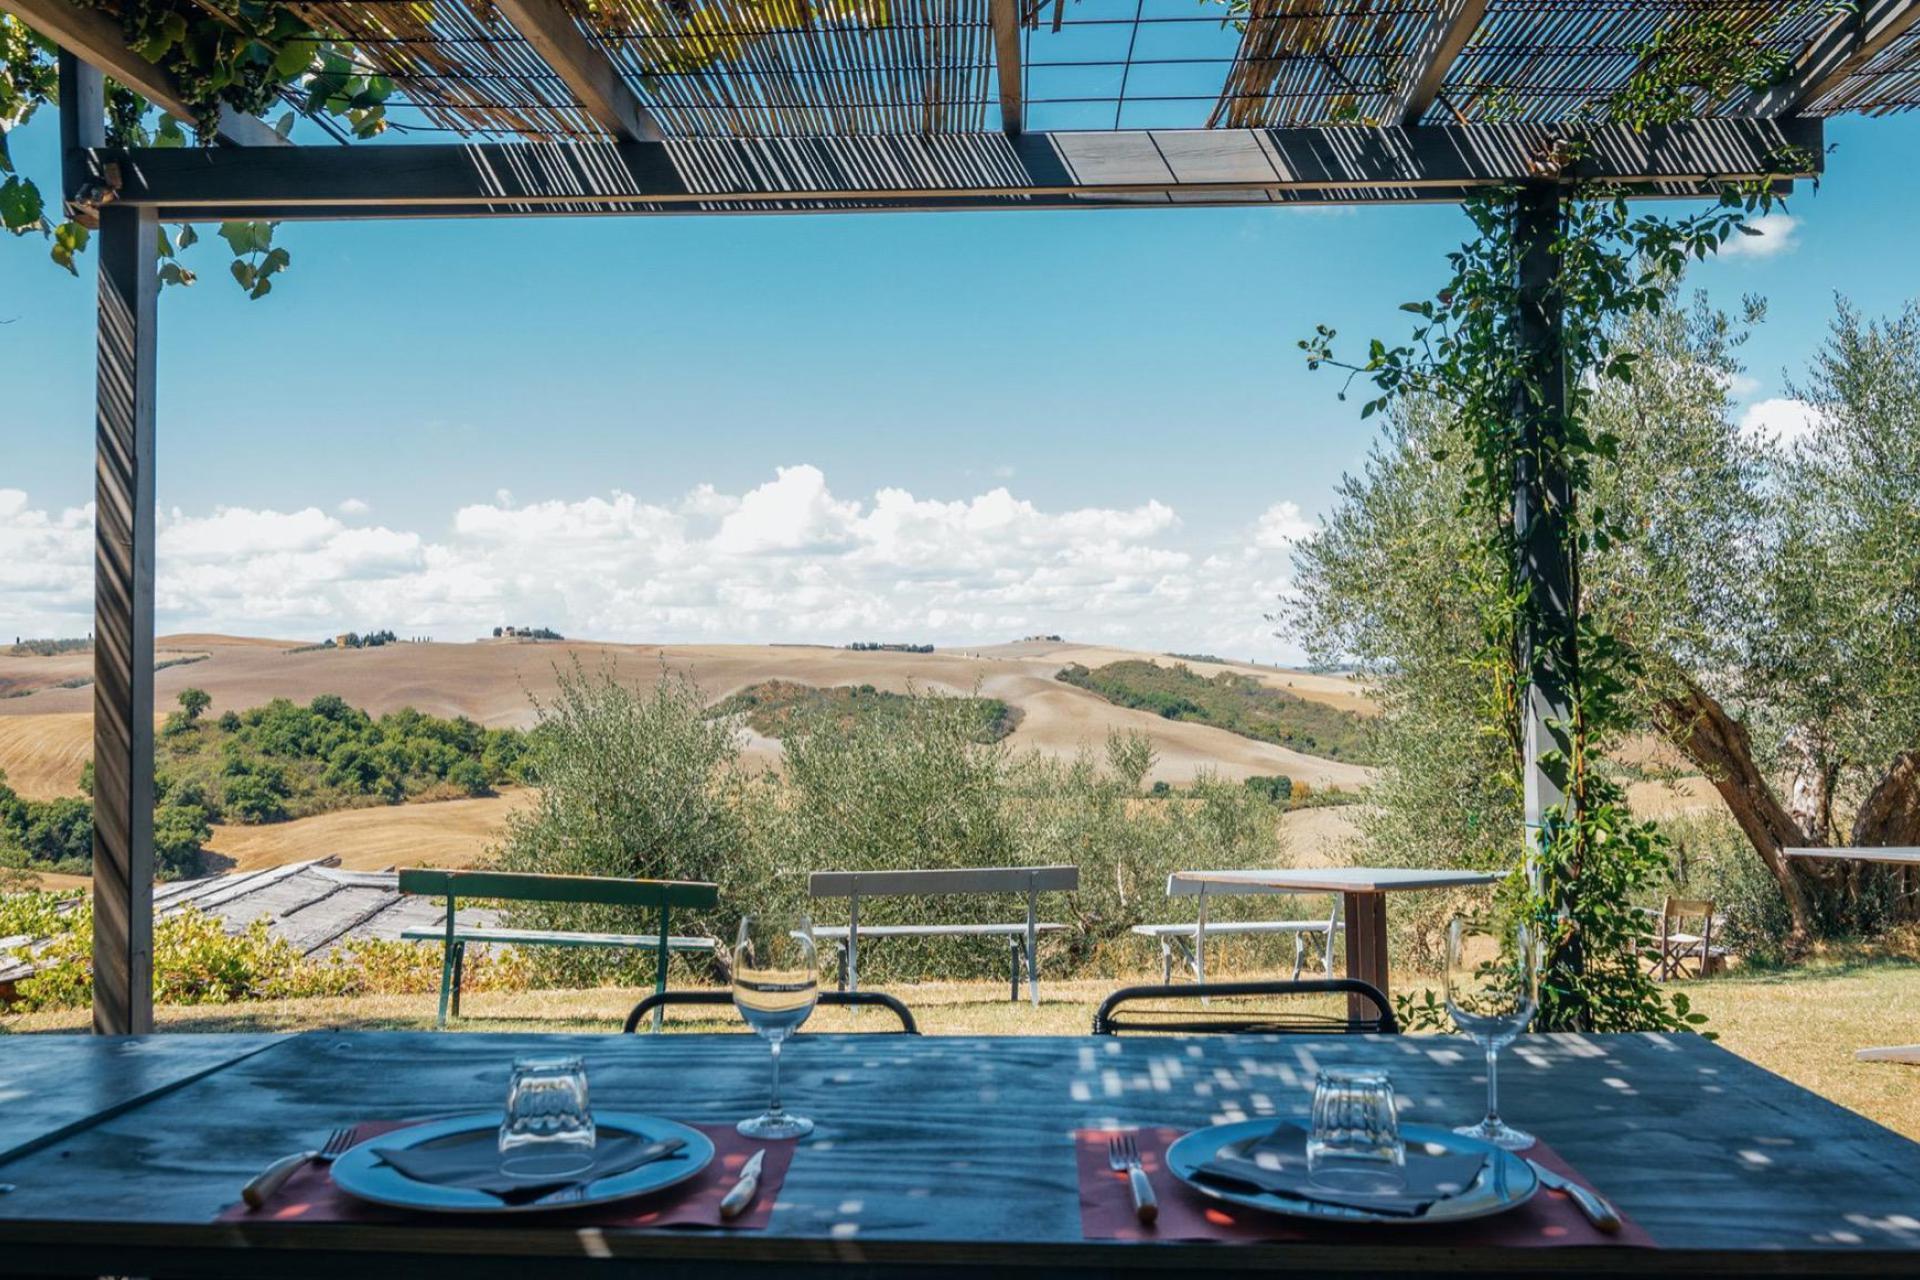 Agriturismo Toscane Agriturismo met restaurant in de buurt van Pienza